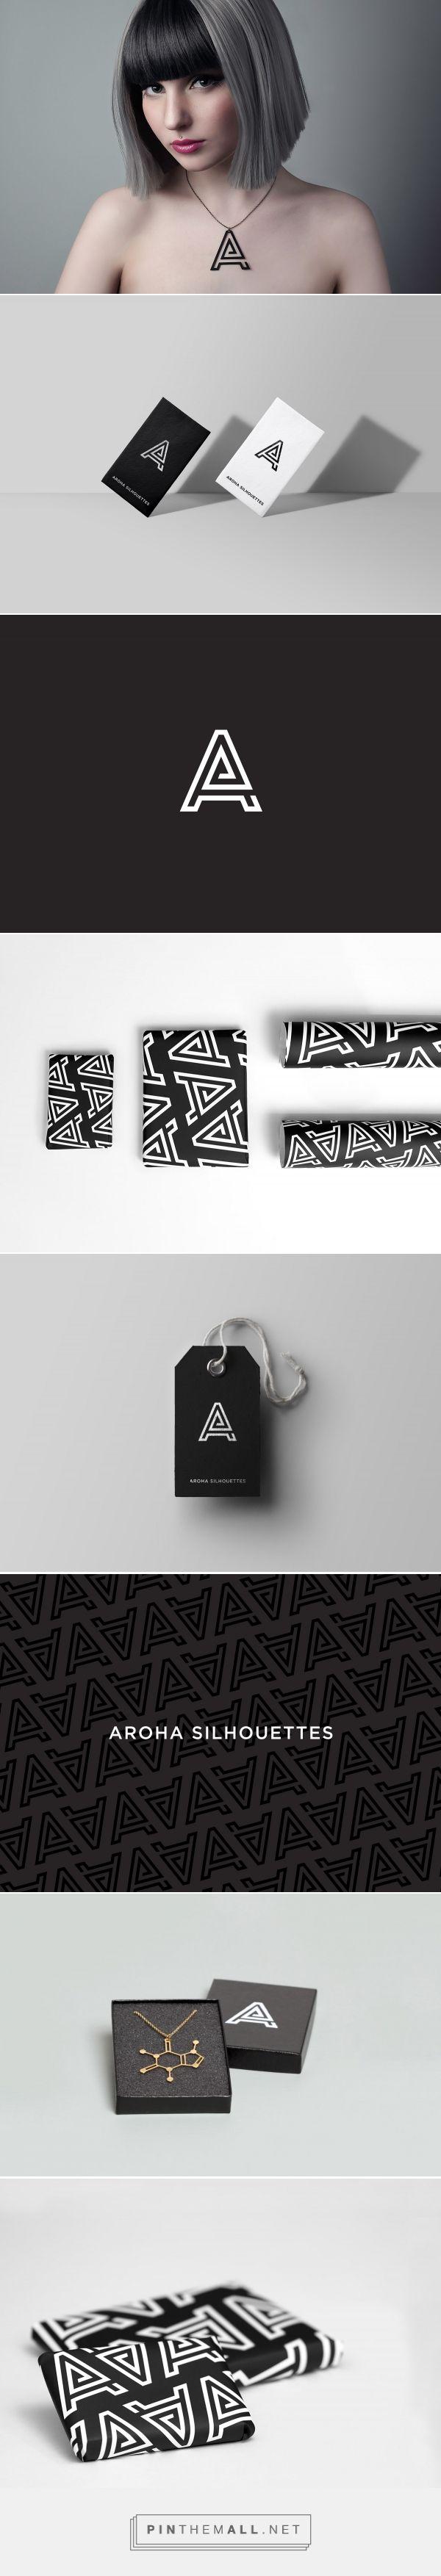 Aroha Silhouettes Branding by We Are Branch   Fivestar Branding – Design and Branding Agency & Inspiration Gallery http://jrstudioweb.com/diseno-grafico/diseno-de-logotipos/